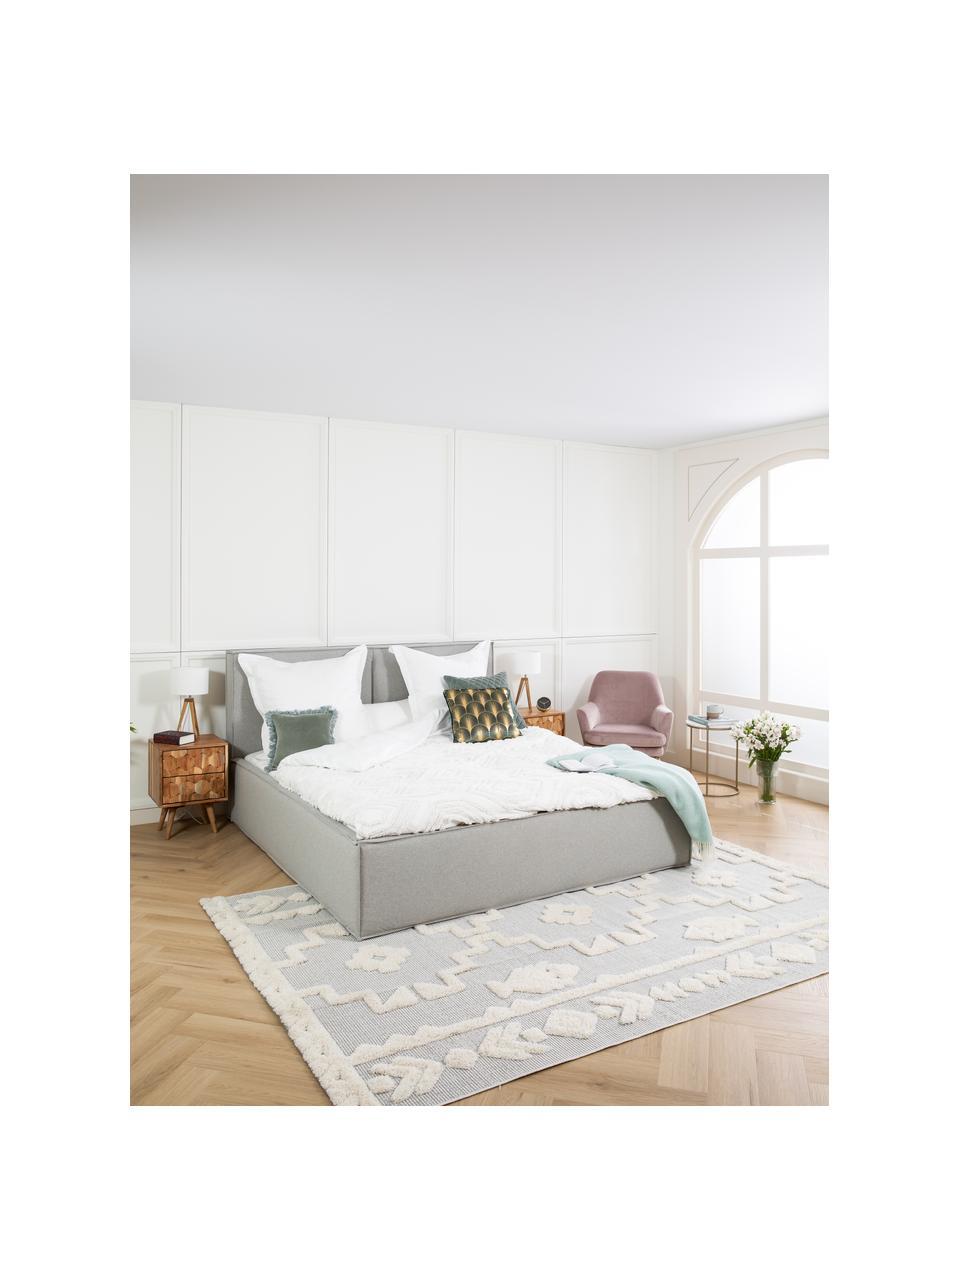 Polsterbett Dream in Hellgrau, Korpus: Massives Kiefernholz und , Bezug: 100% Polyester (Strukturs, Webstoff Hellgrau, 180 x 200 cm